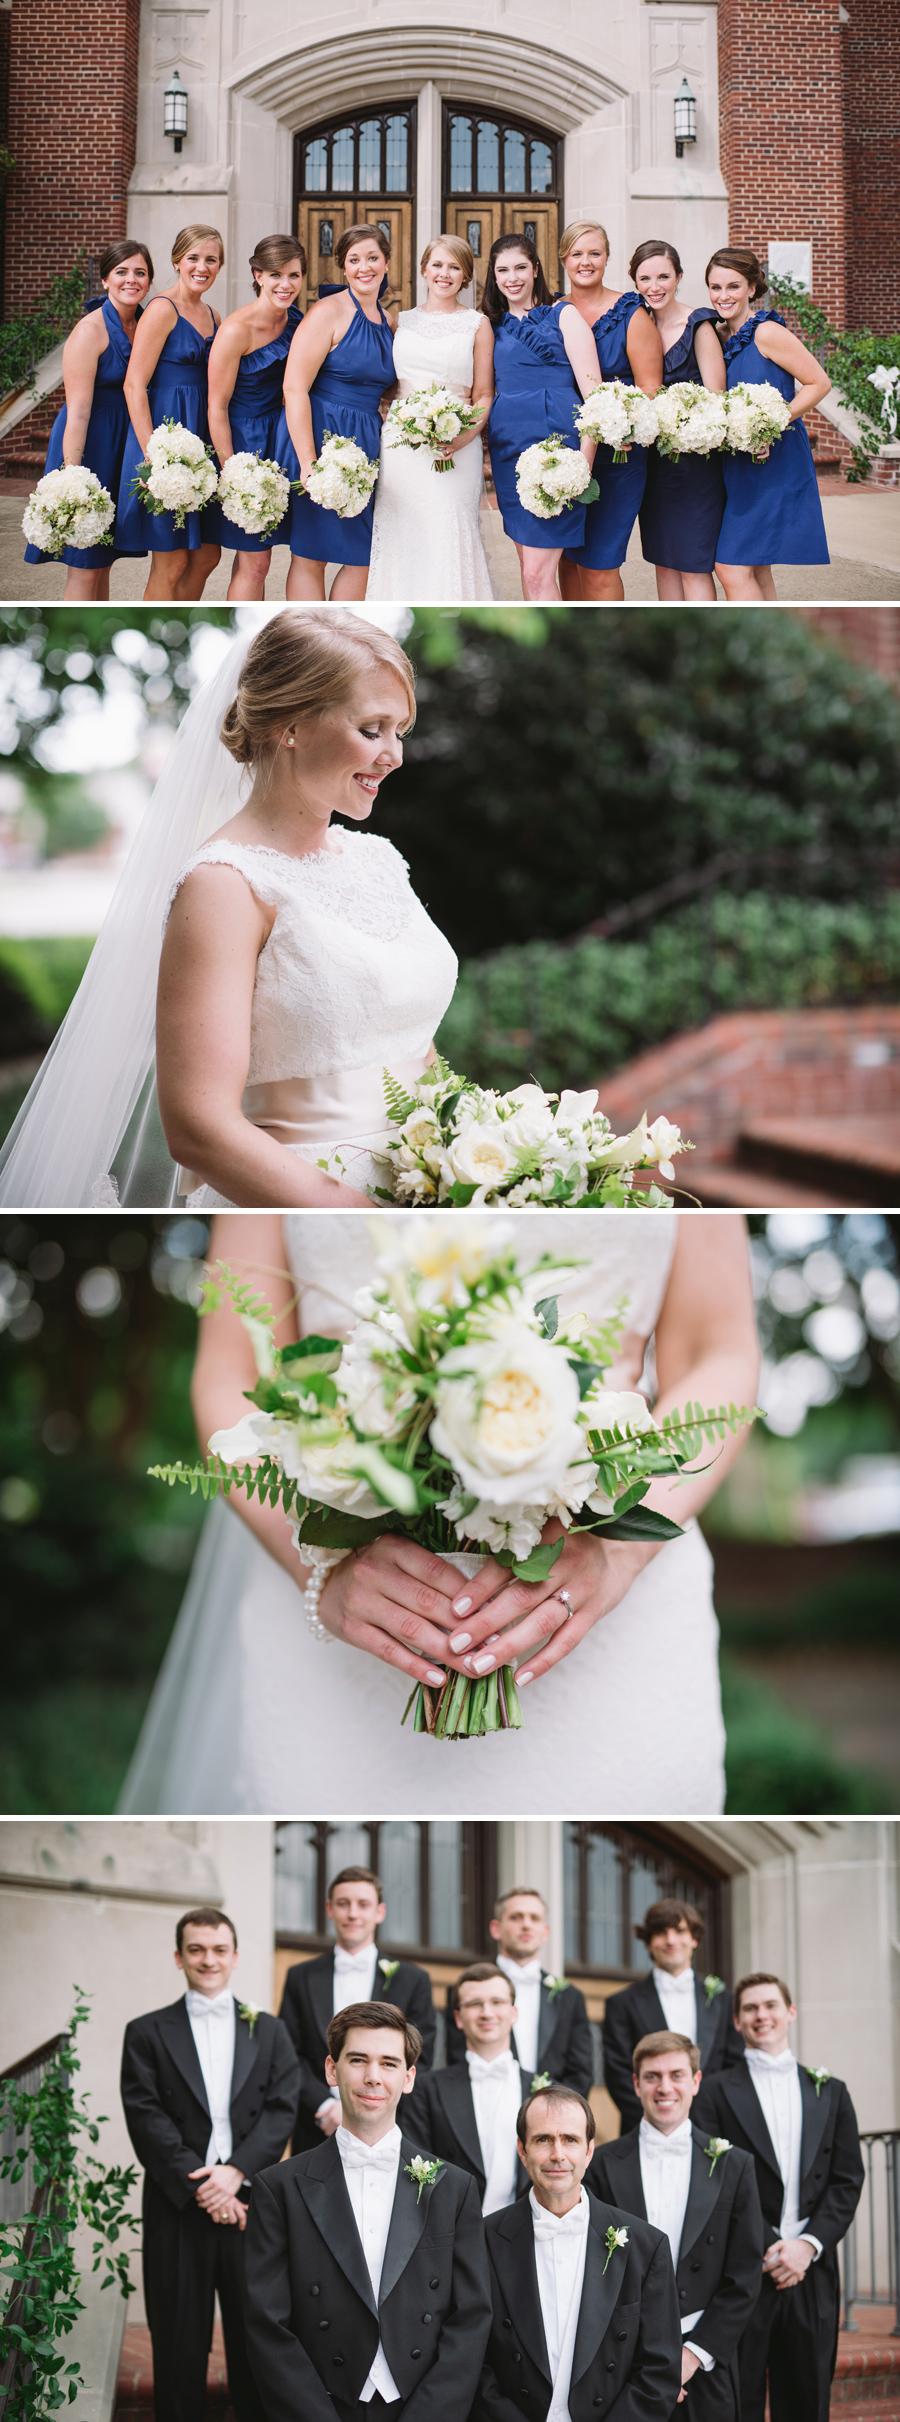 meagan-hampton-wedding-701-whaley